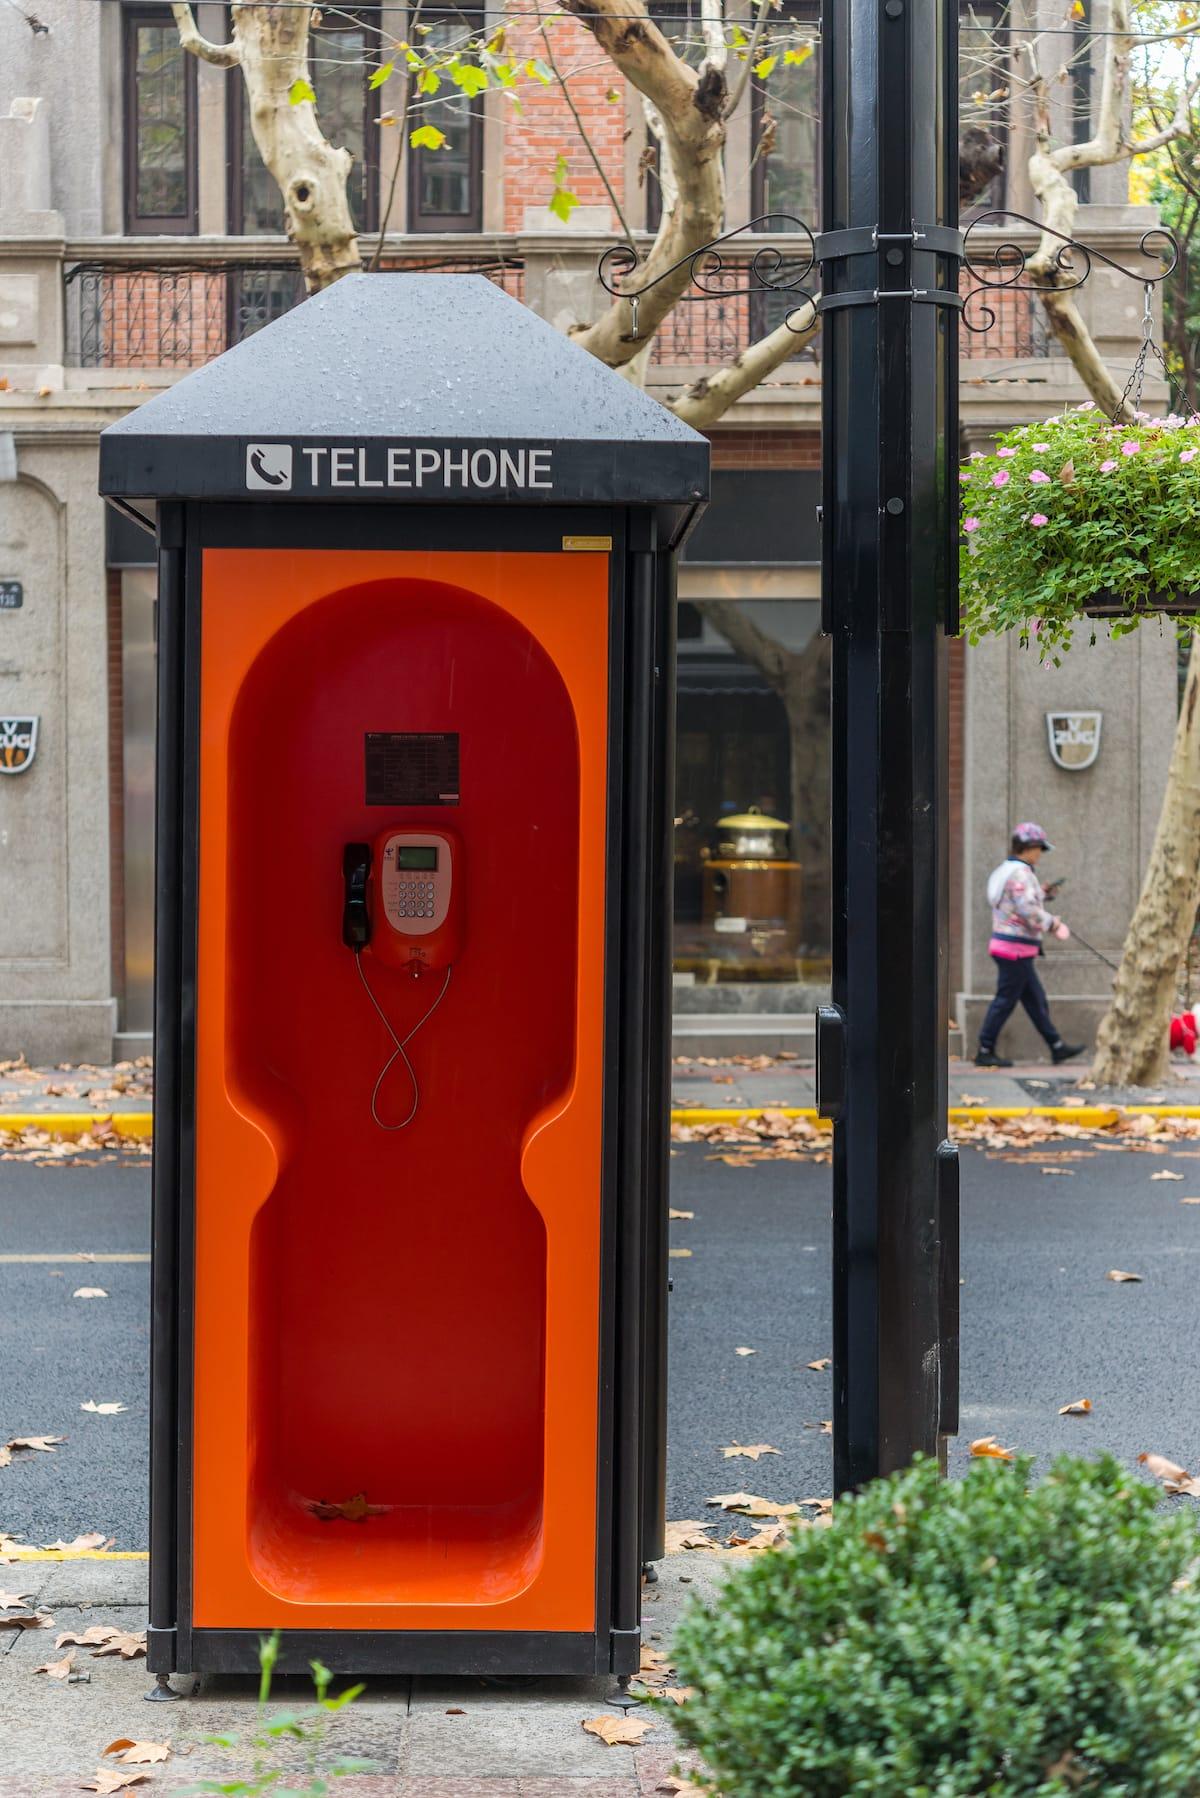 Orange Phone Booths Installed In Yuyuan Road, Shanghai